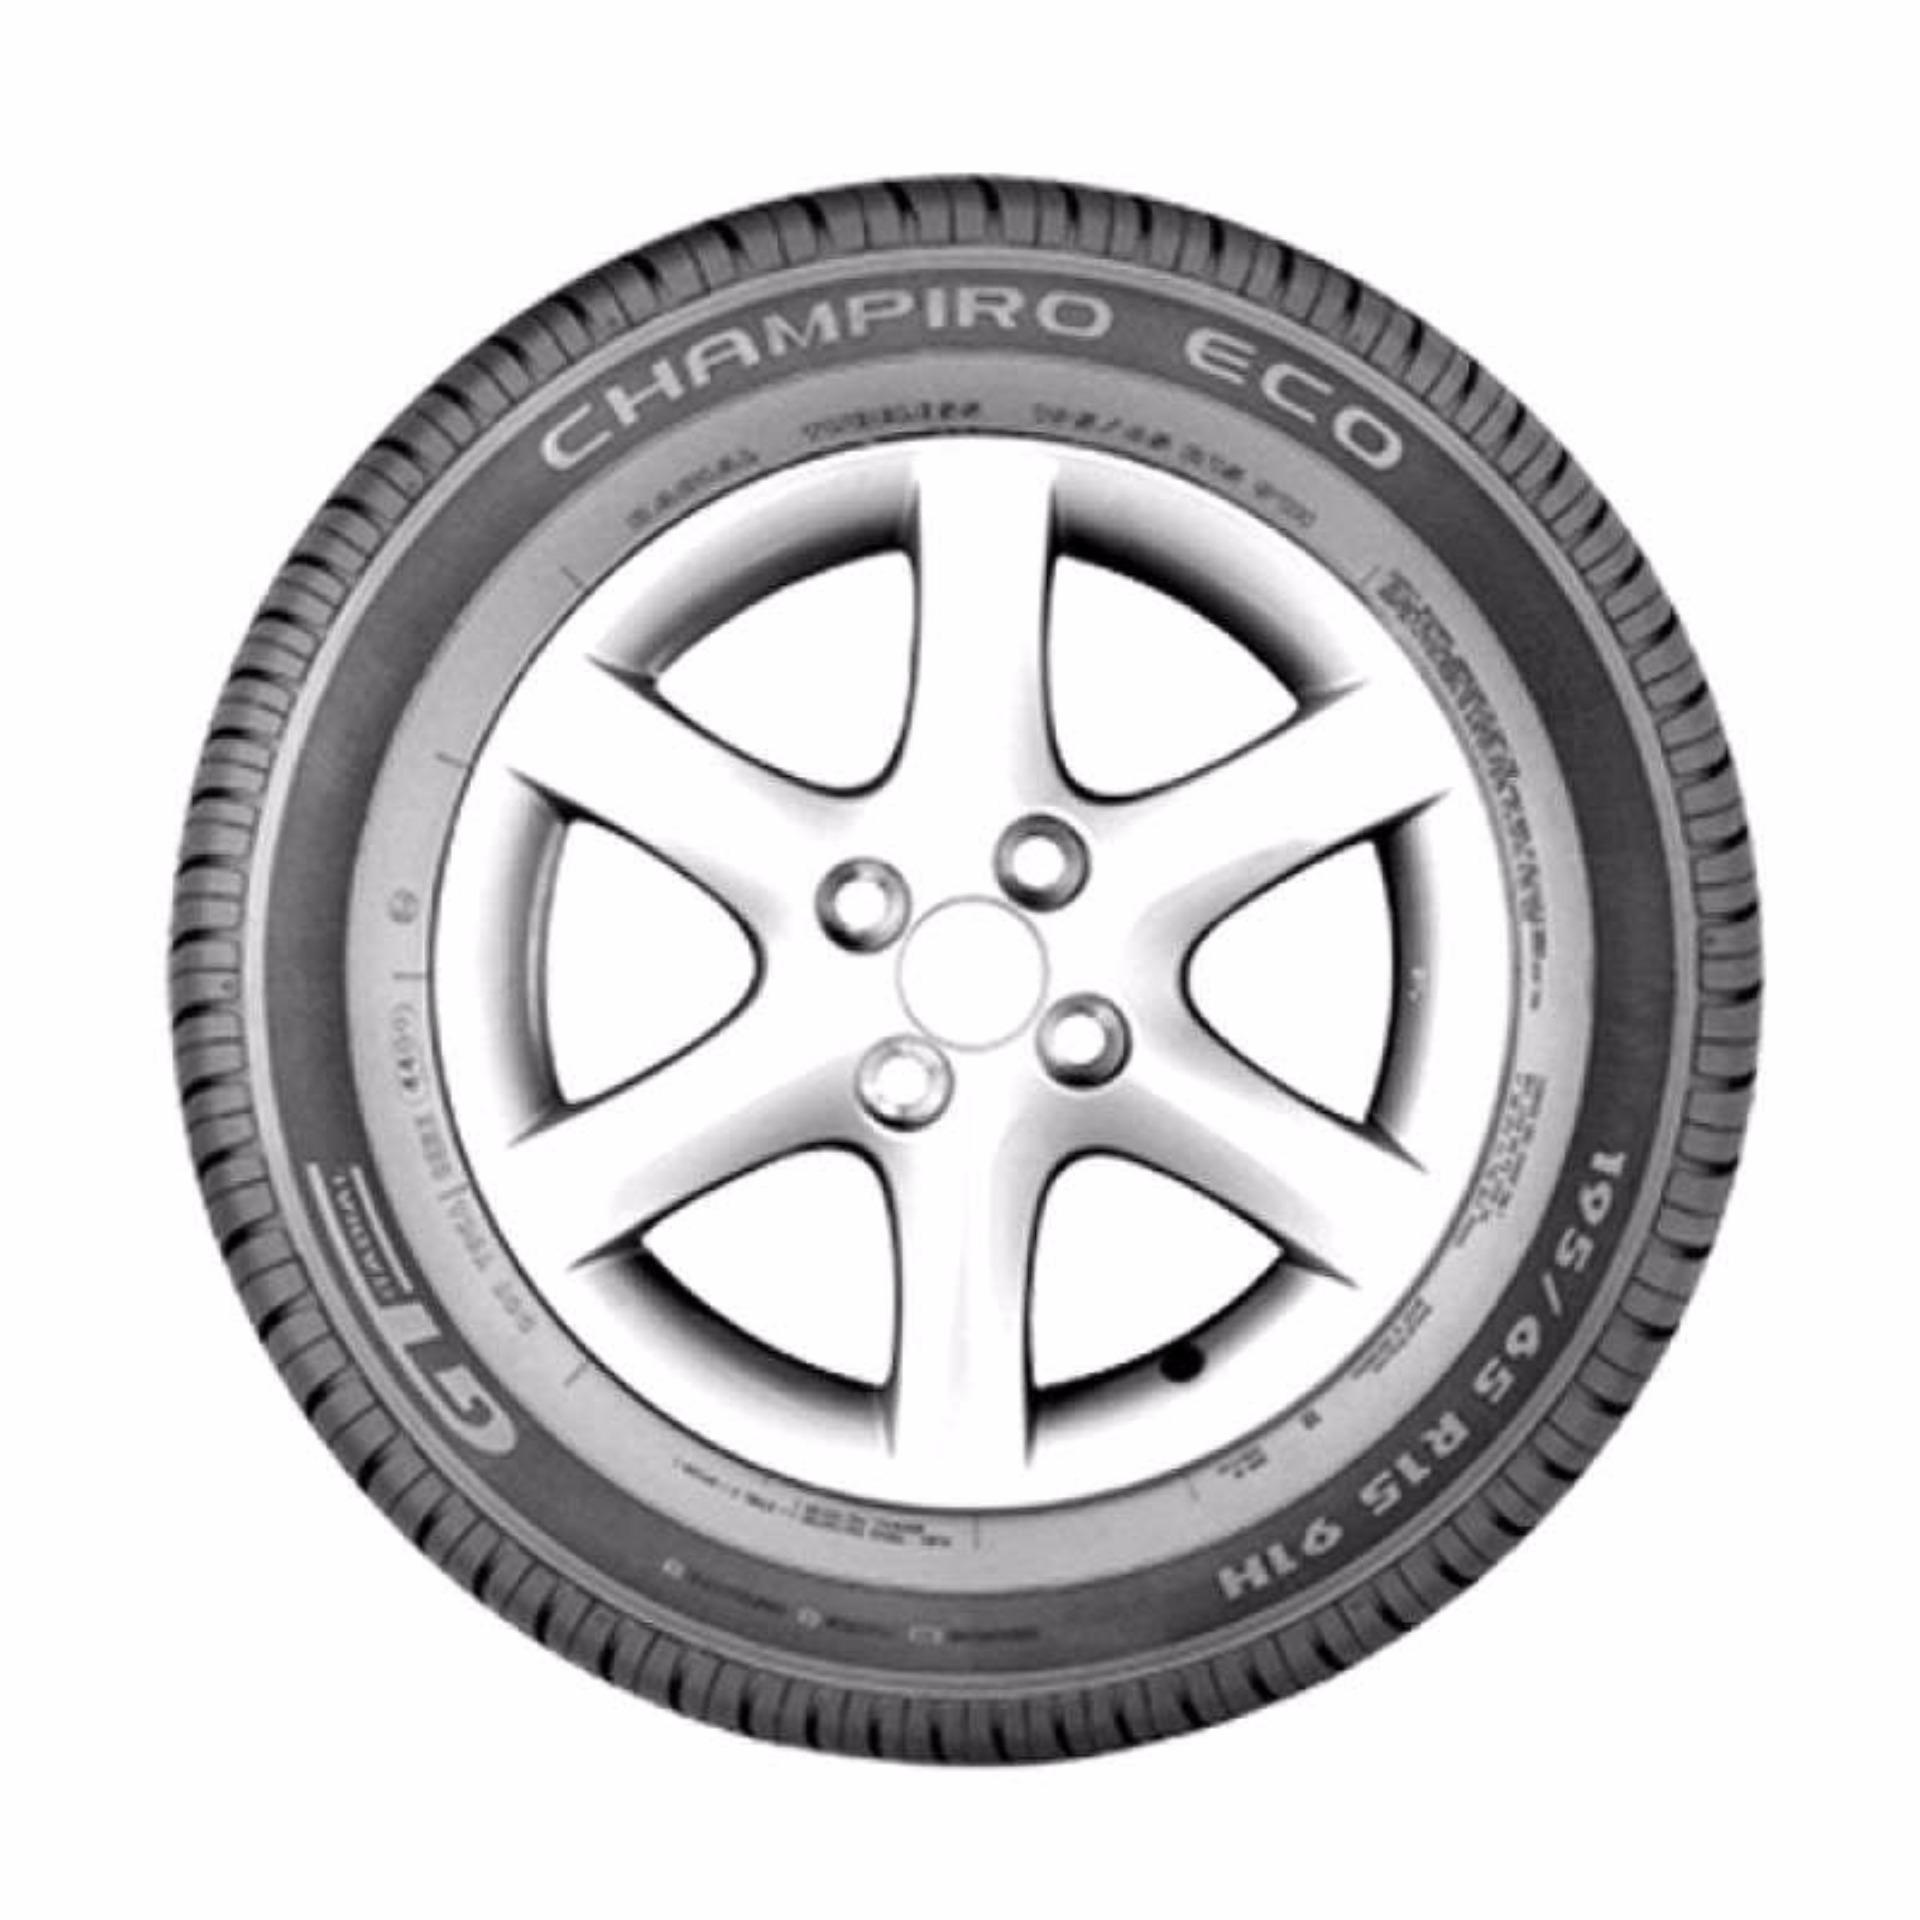 GT Champiro Eco 175/60 R15 Ban Mobil [GRATIS INSTALASI]